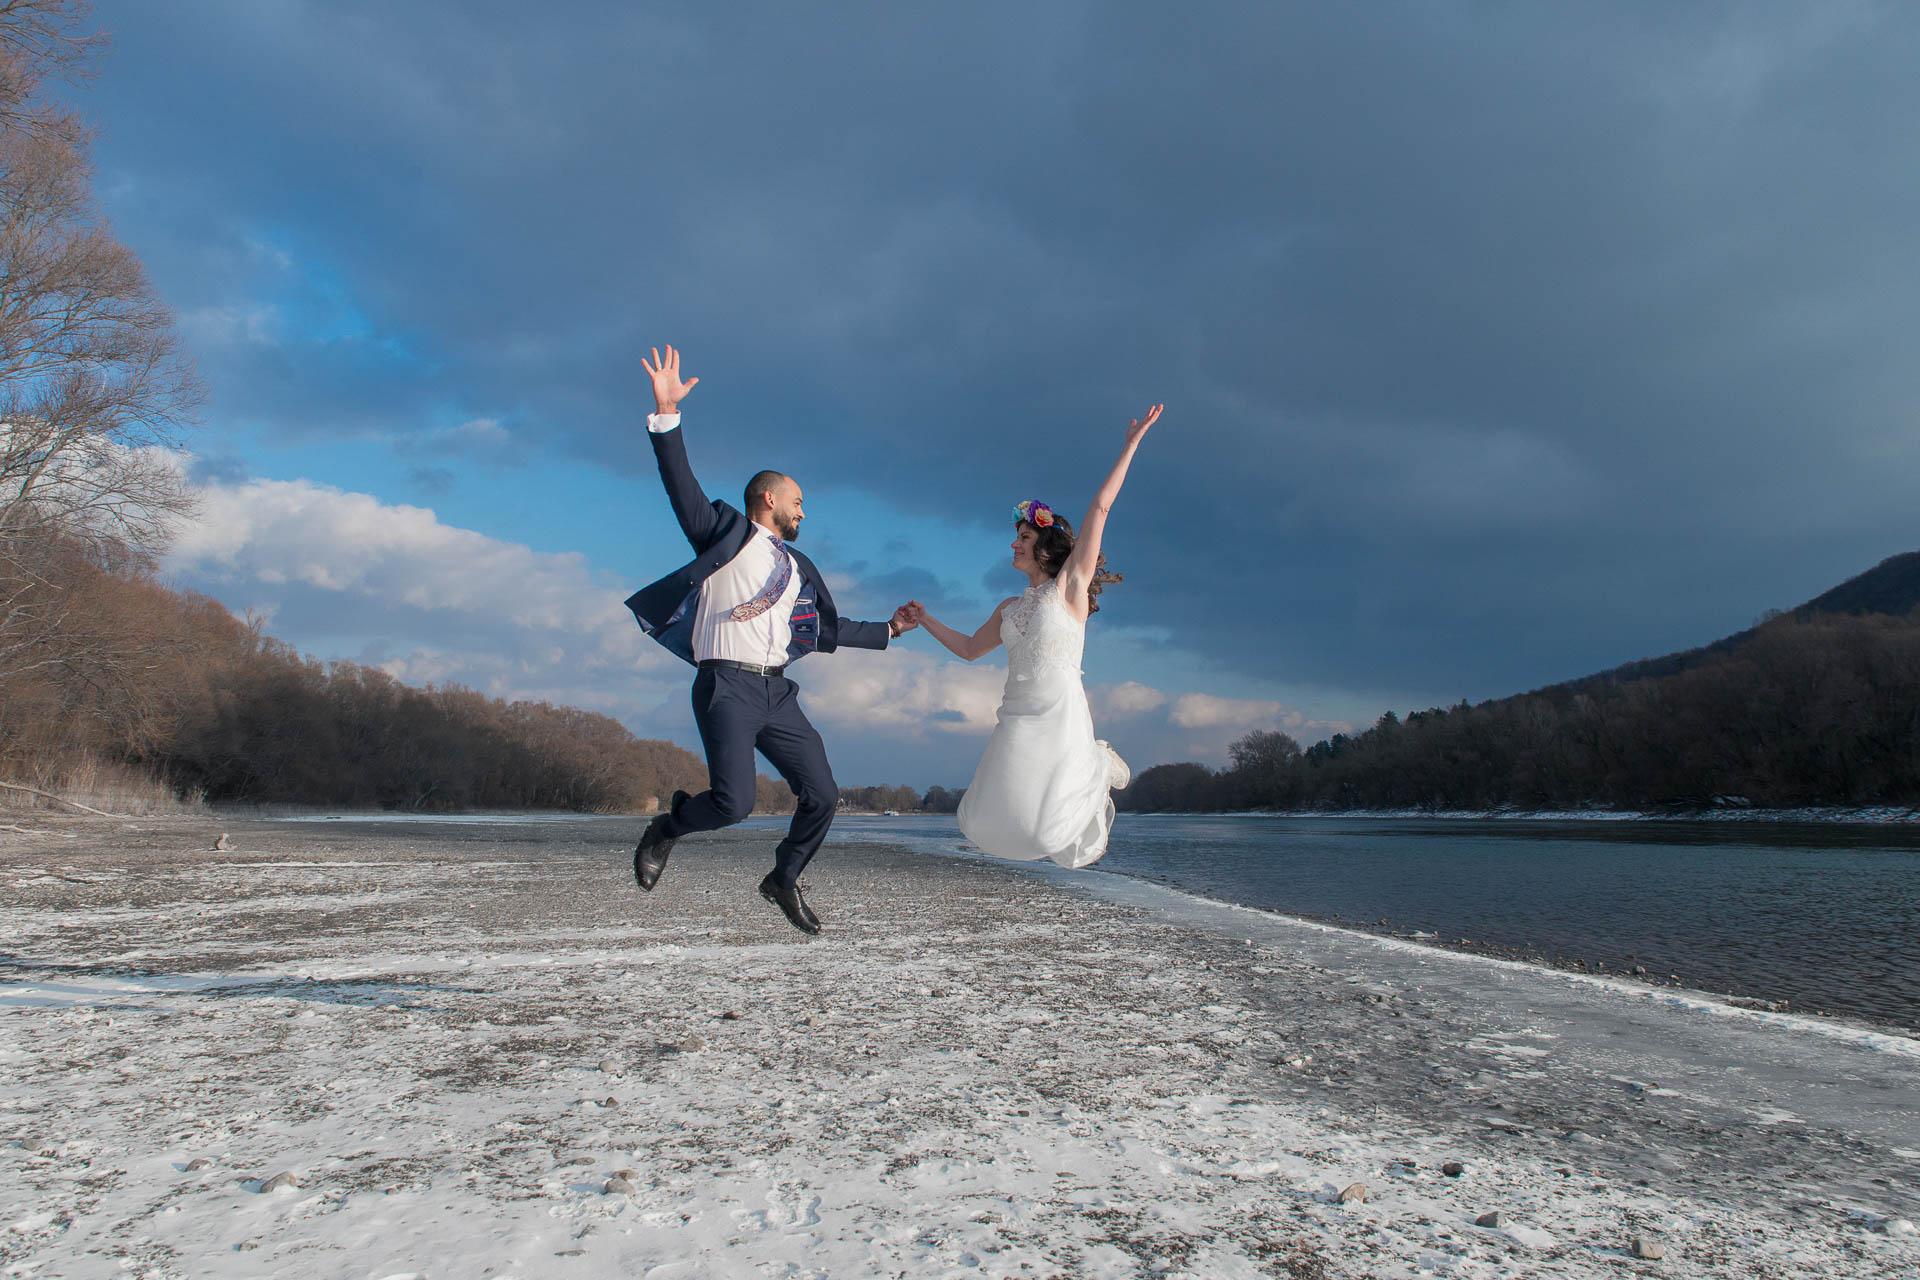 Adventure wedding in Hungary - hiking and kayaking - wedding couple jumping in joy at riverside